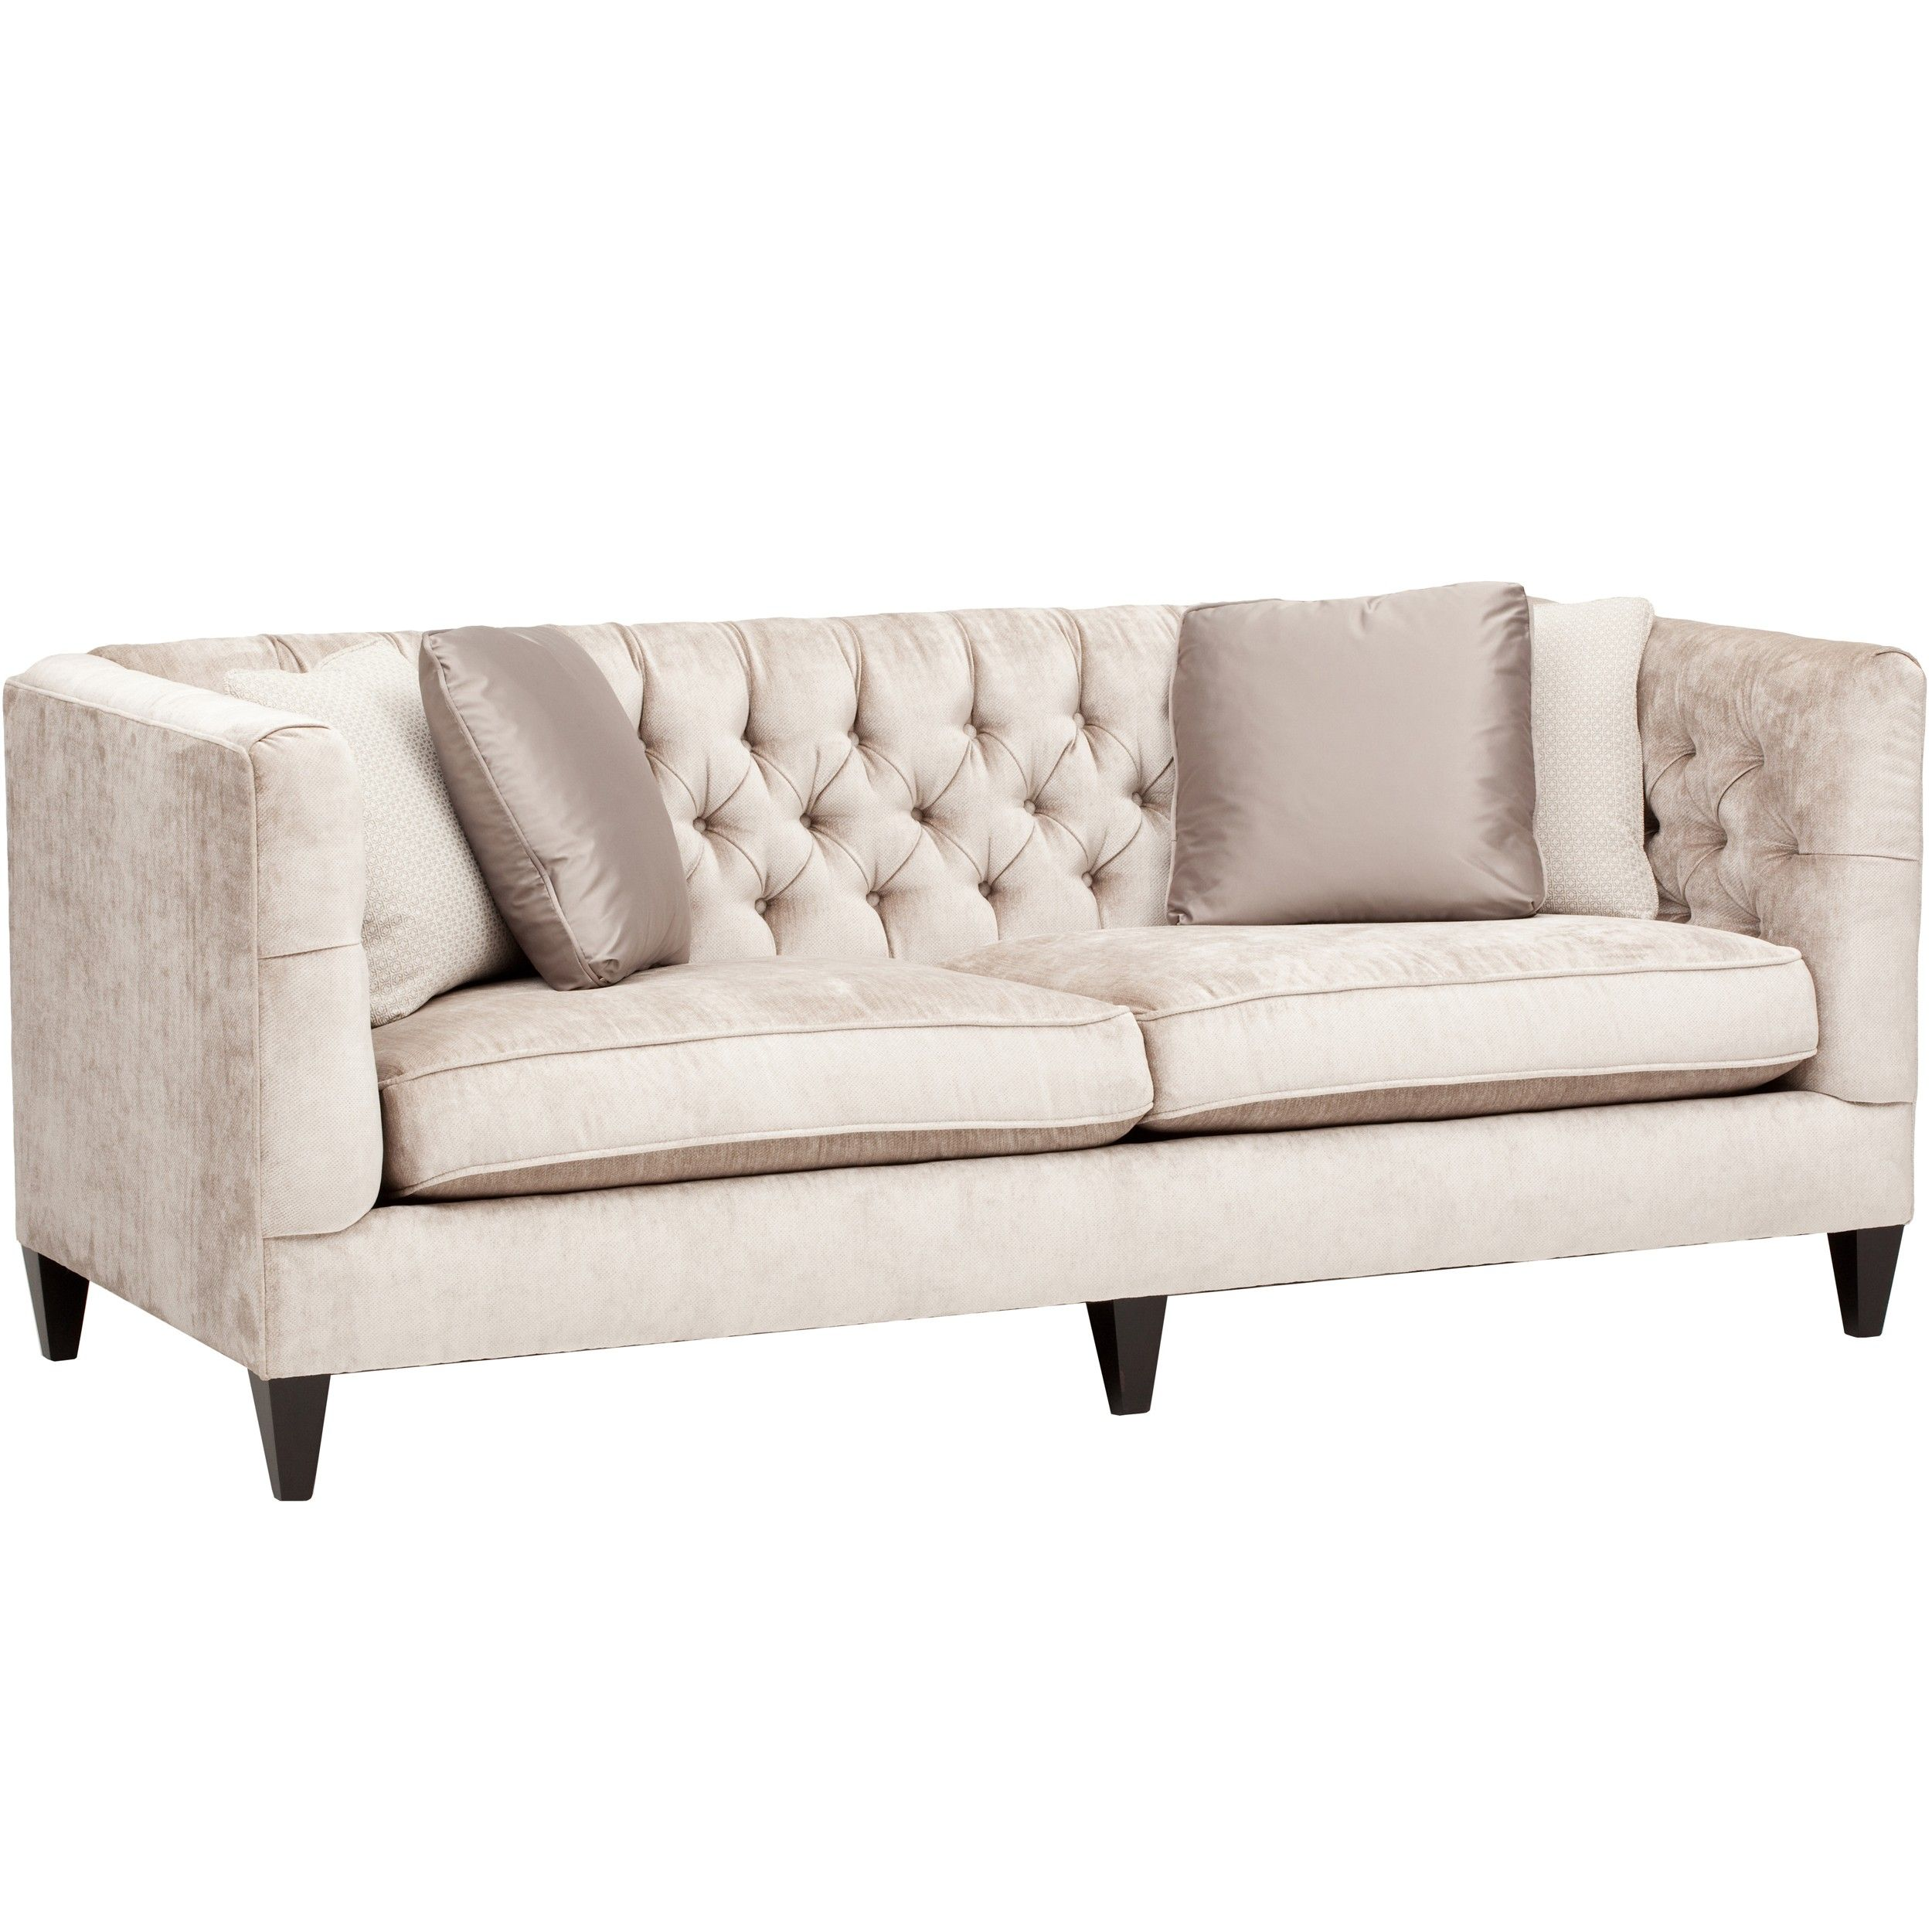 Beckett Sofa - Fabric - Sofas - Furniture